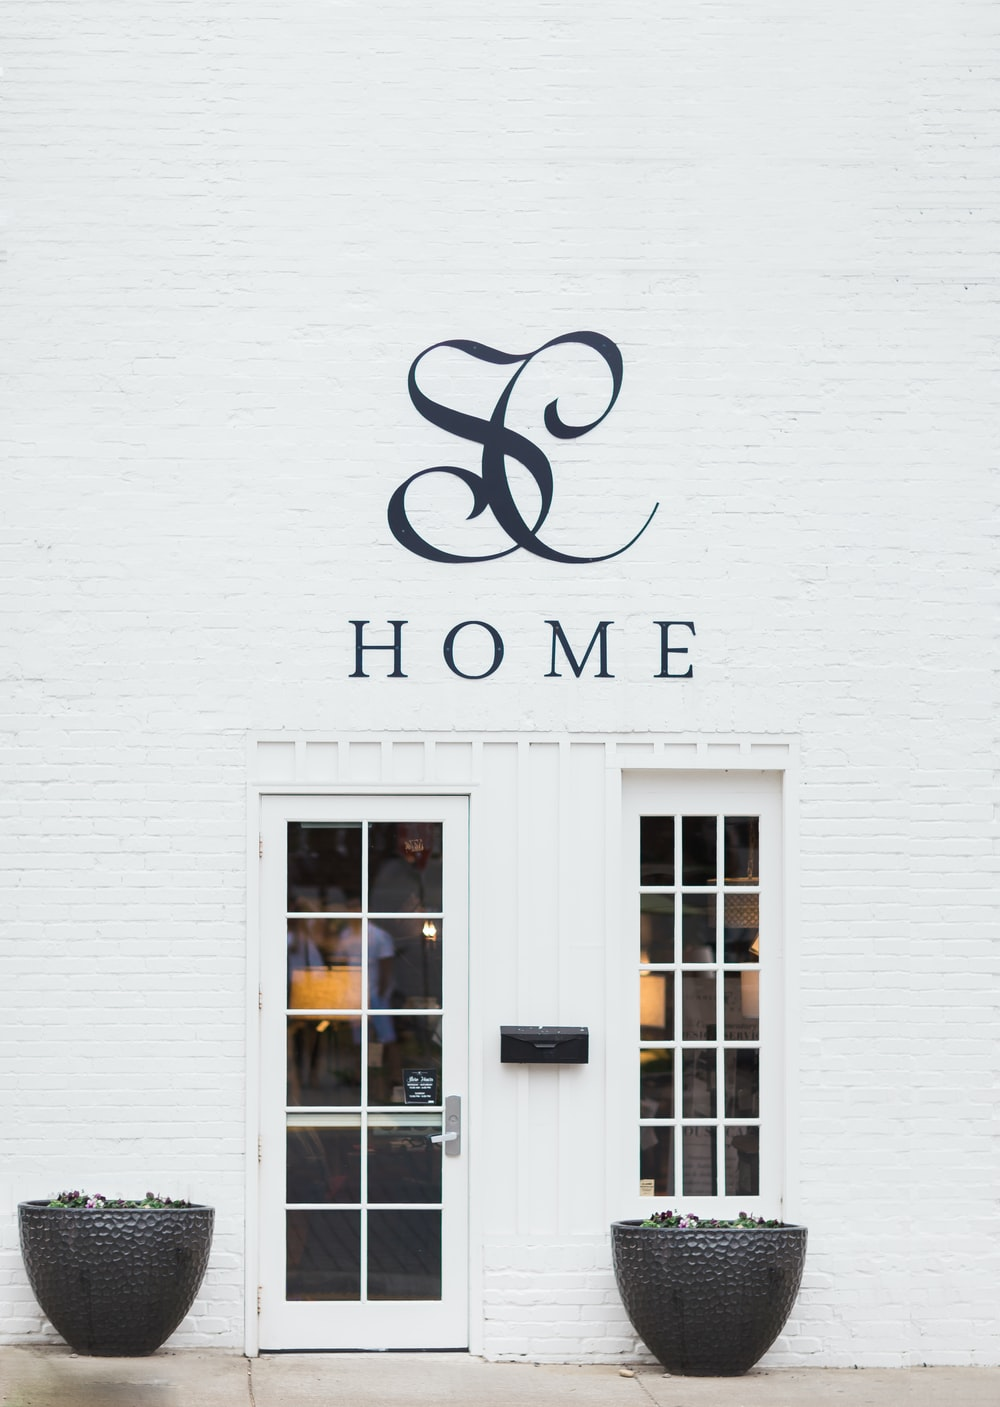 Home storefront beside white door